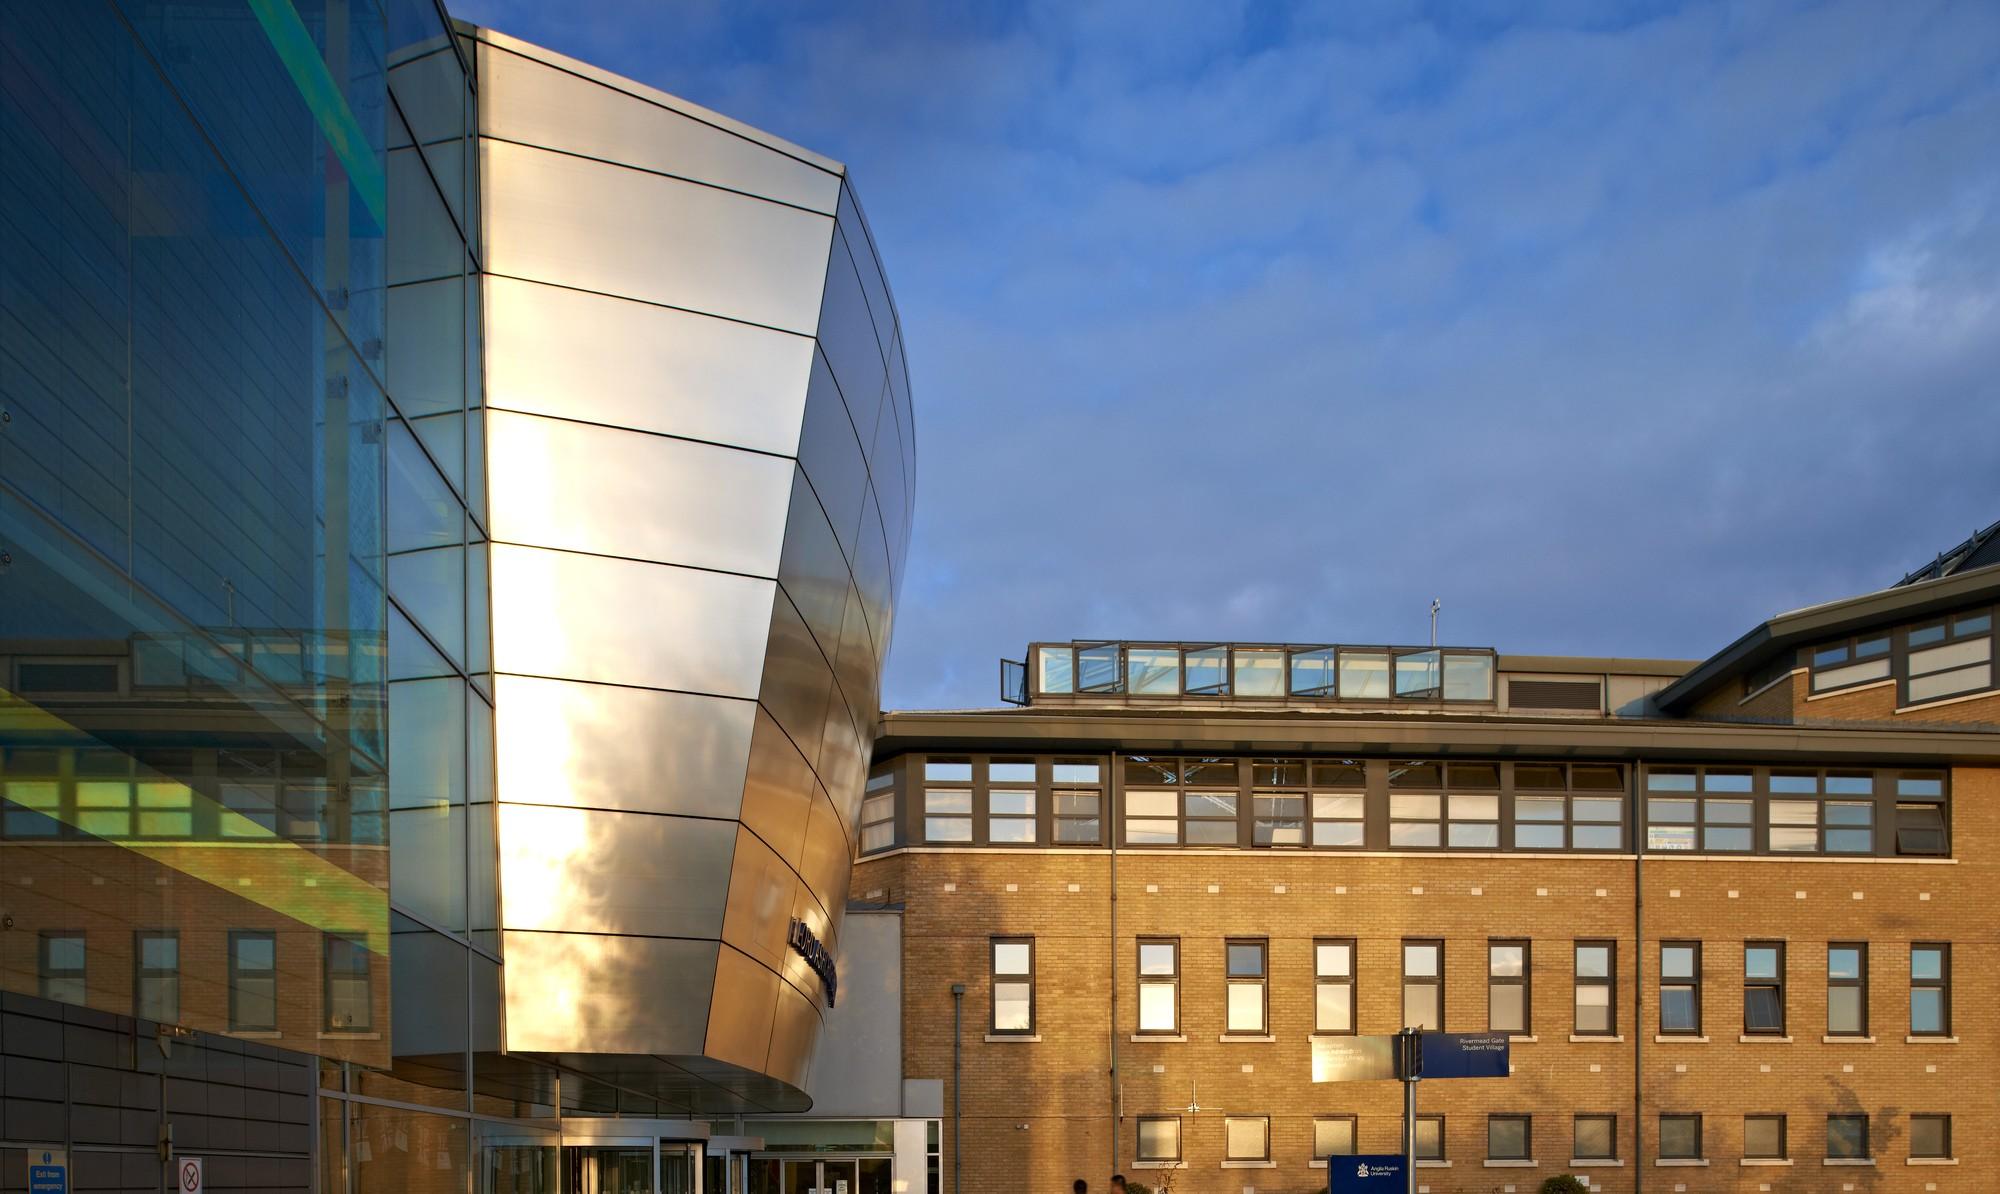 Anglia Ruskin University - London